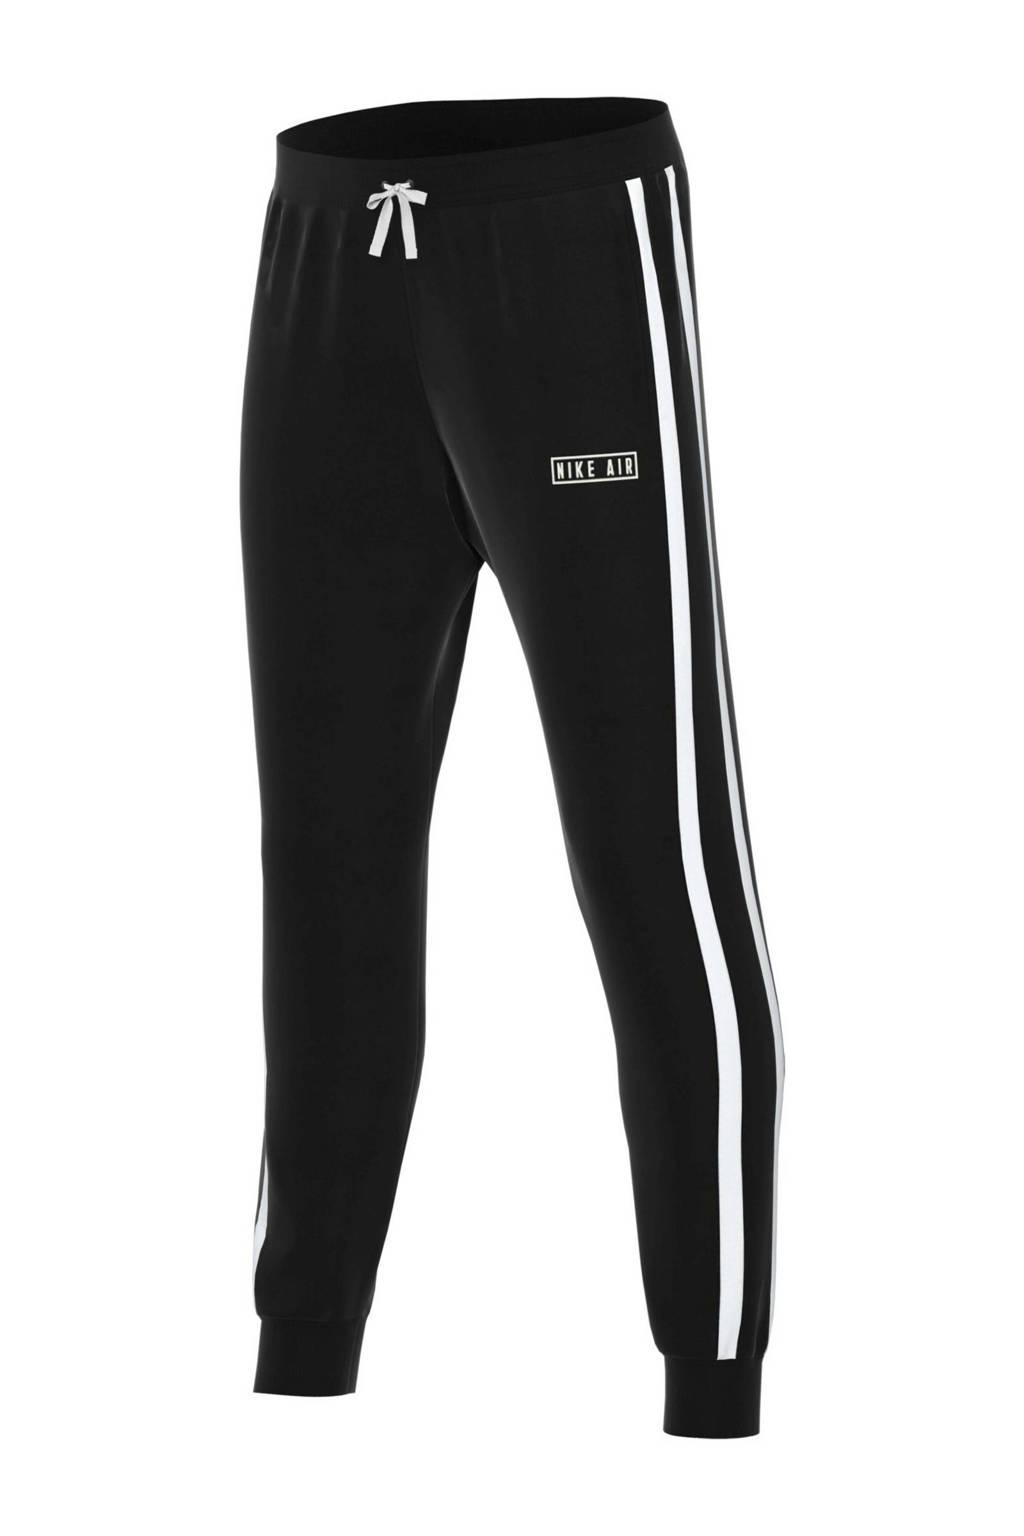 Nike Air regular fit joggingbroek zwart/wit, Zwart/wit